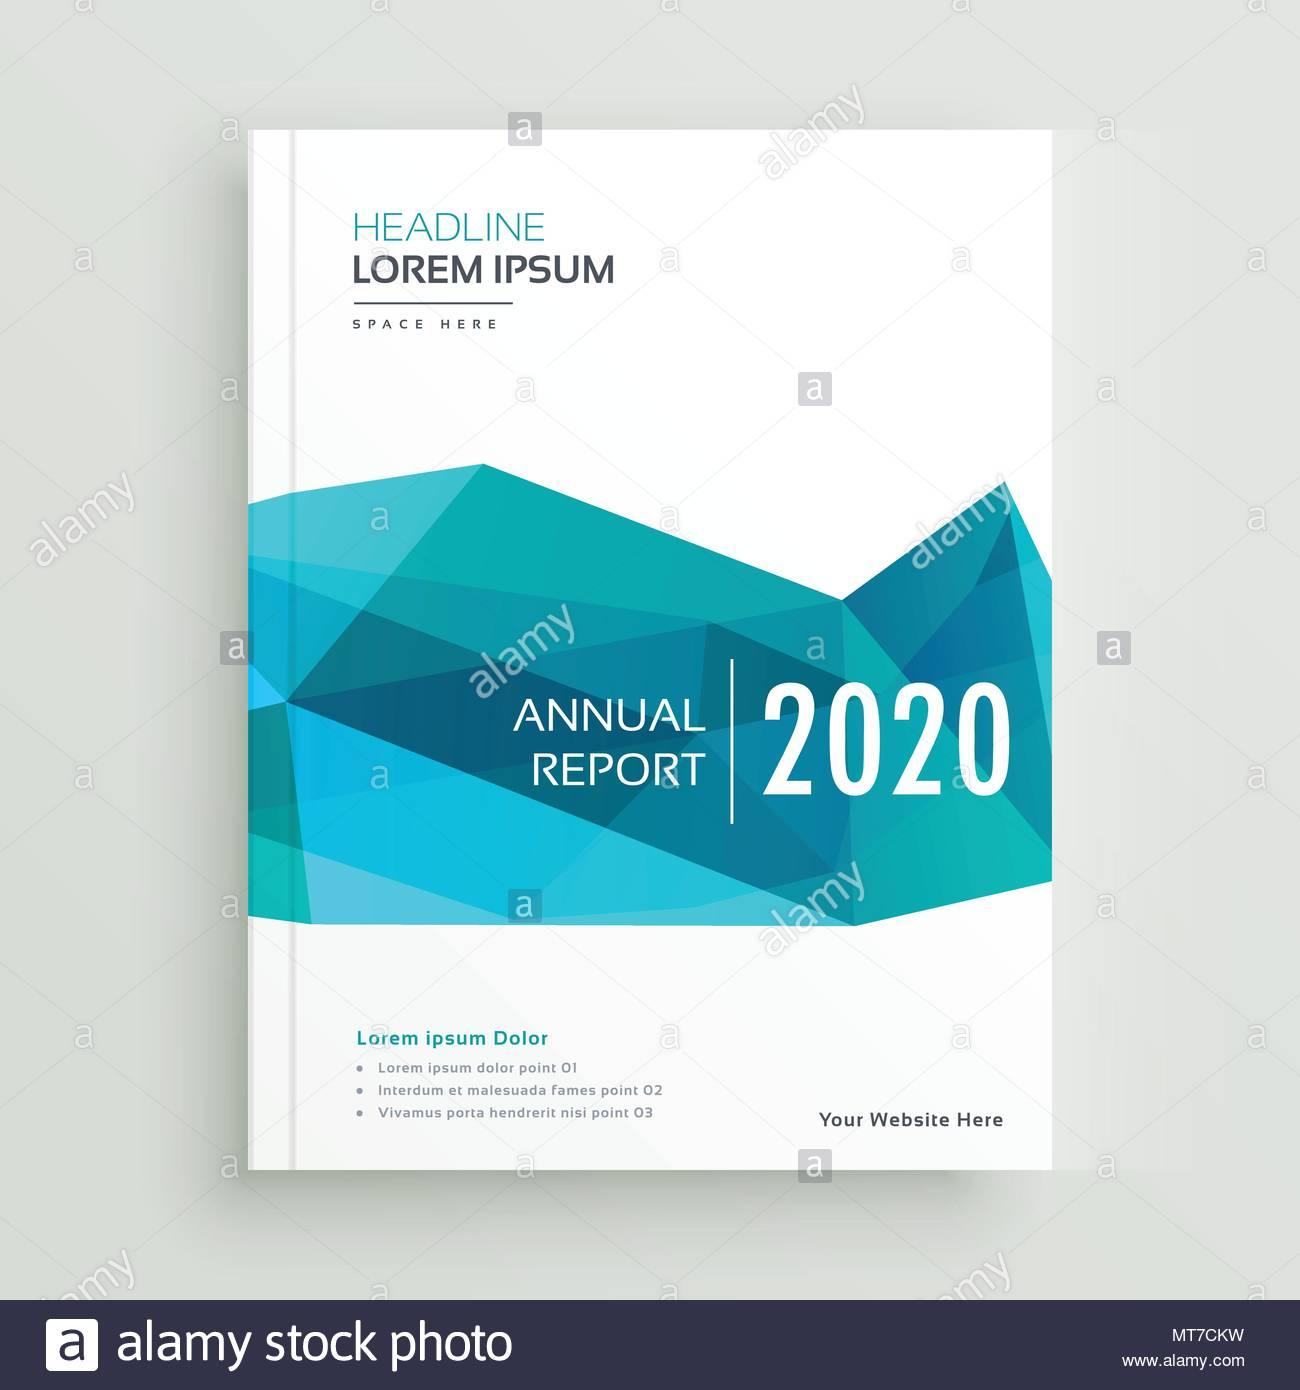 Moderne Blaue Geometrische Broschüre Deckblatt Design Vektor